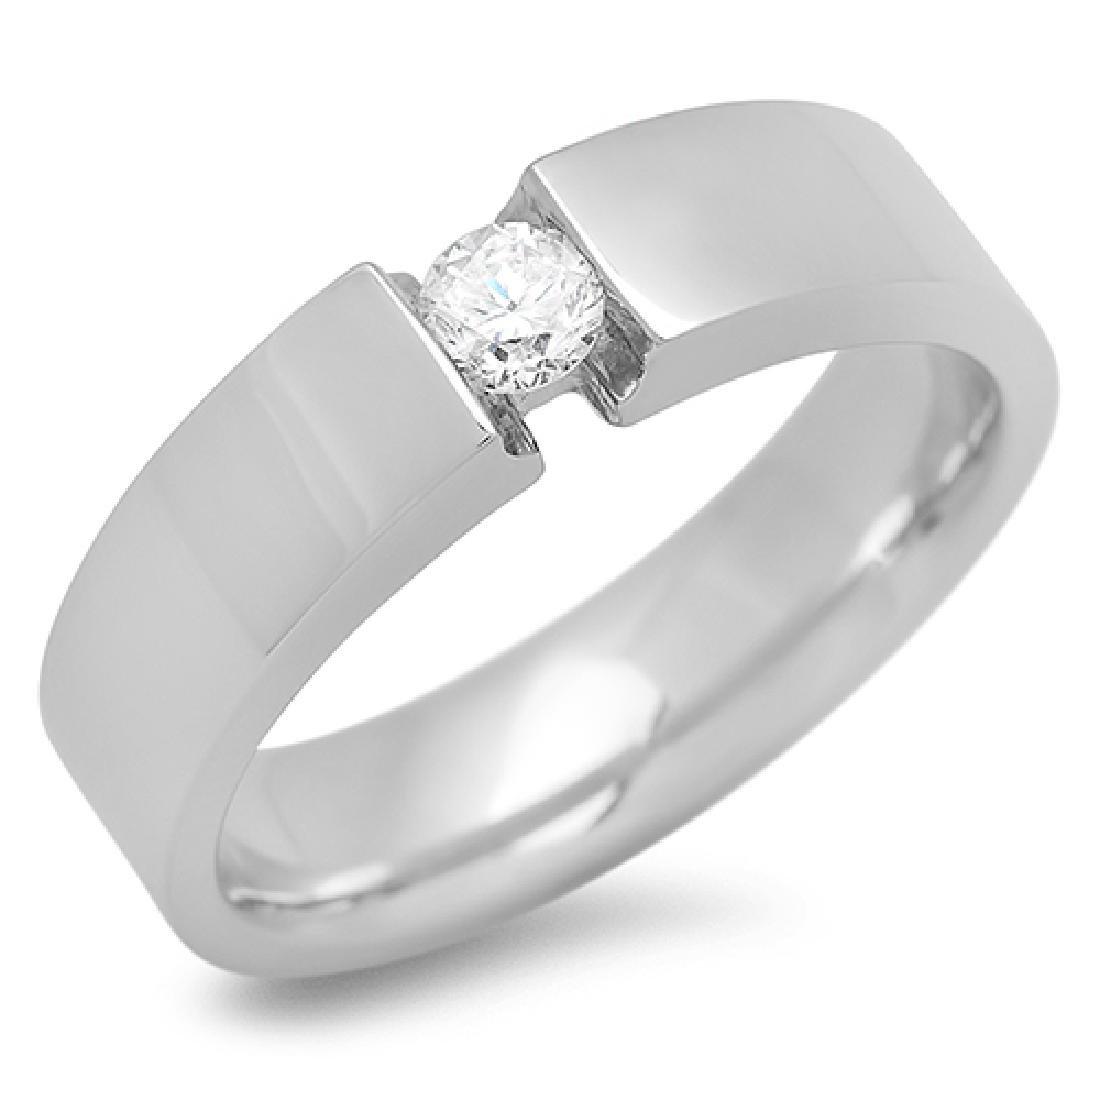 Mens 0.32 Carat Natural Diamond 18K Solid White Gold - 2